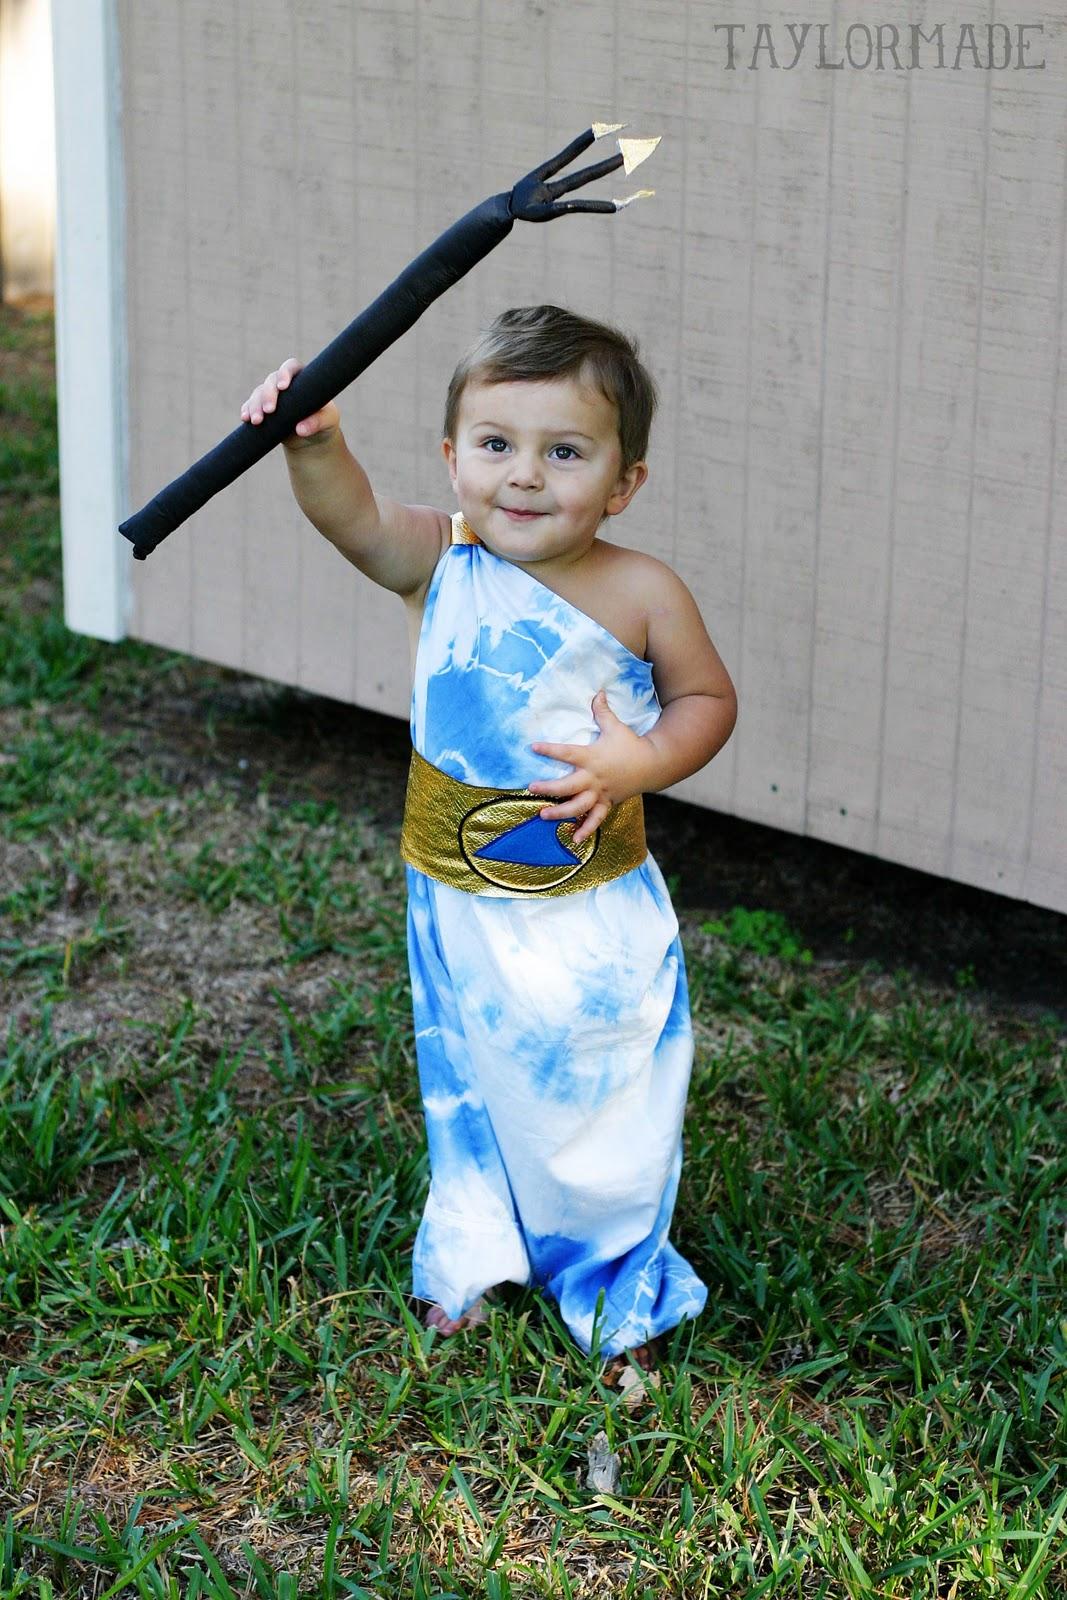 Poseidon - King of the Sea... a costume - TaylorMade